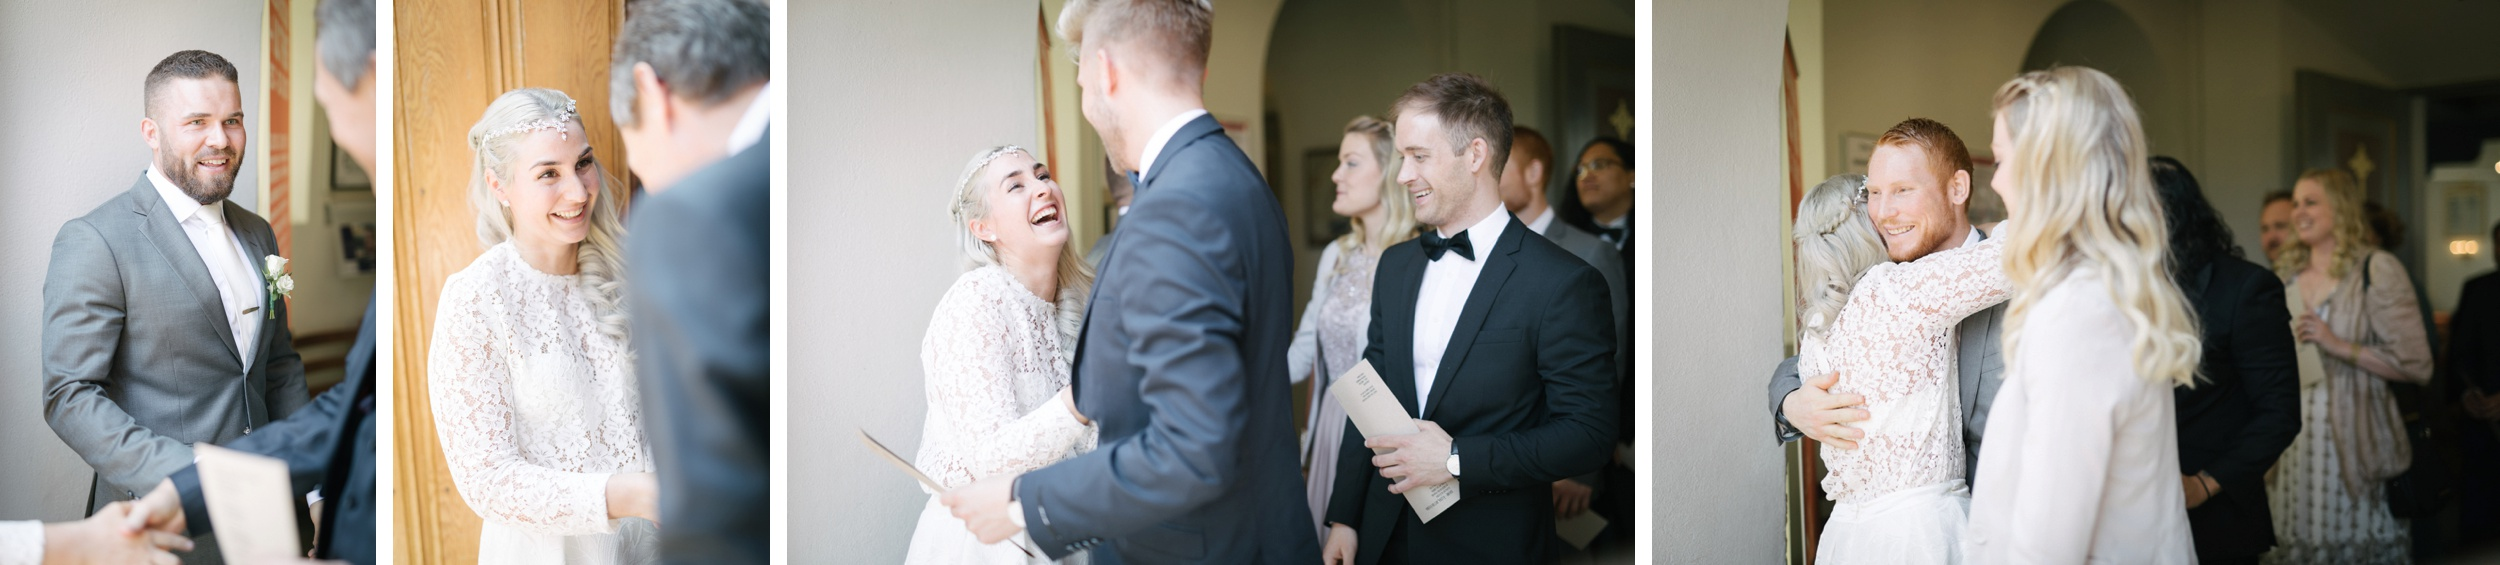 bryllup-bryllupsfotografering-bryllupsfotograf-sarpsborg-20170520-_H2A0613Camilla-og-ruben_WEB.jpg